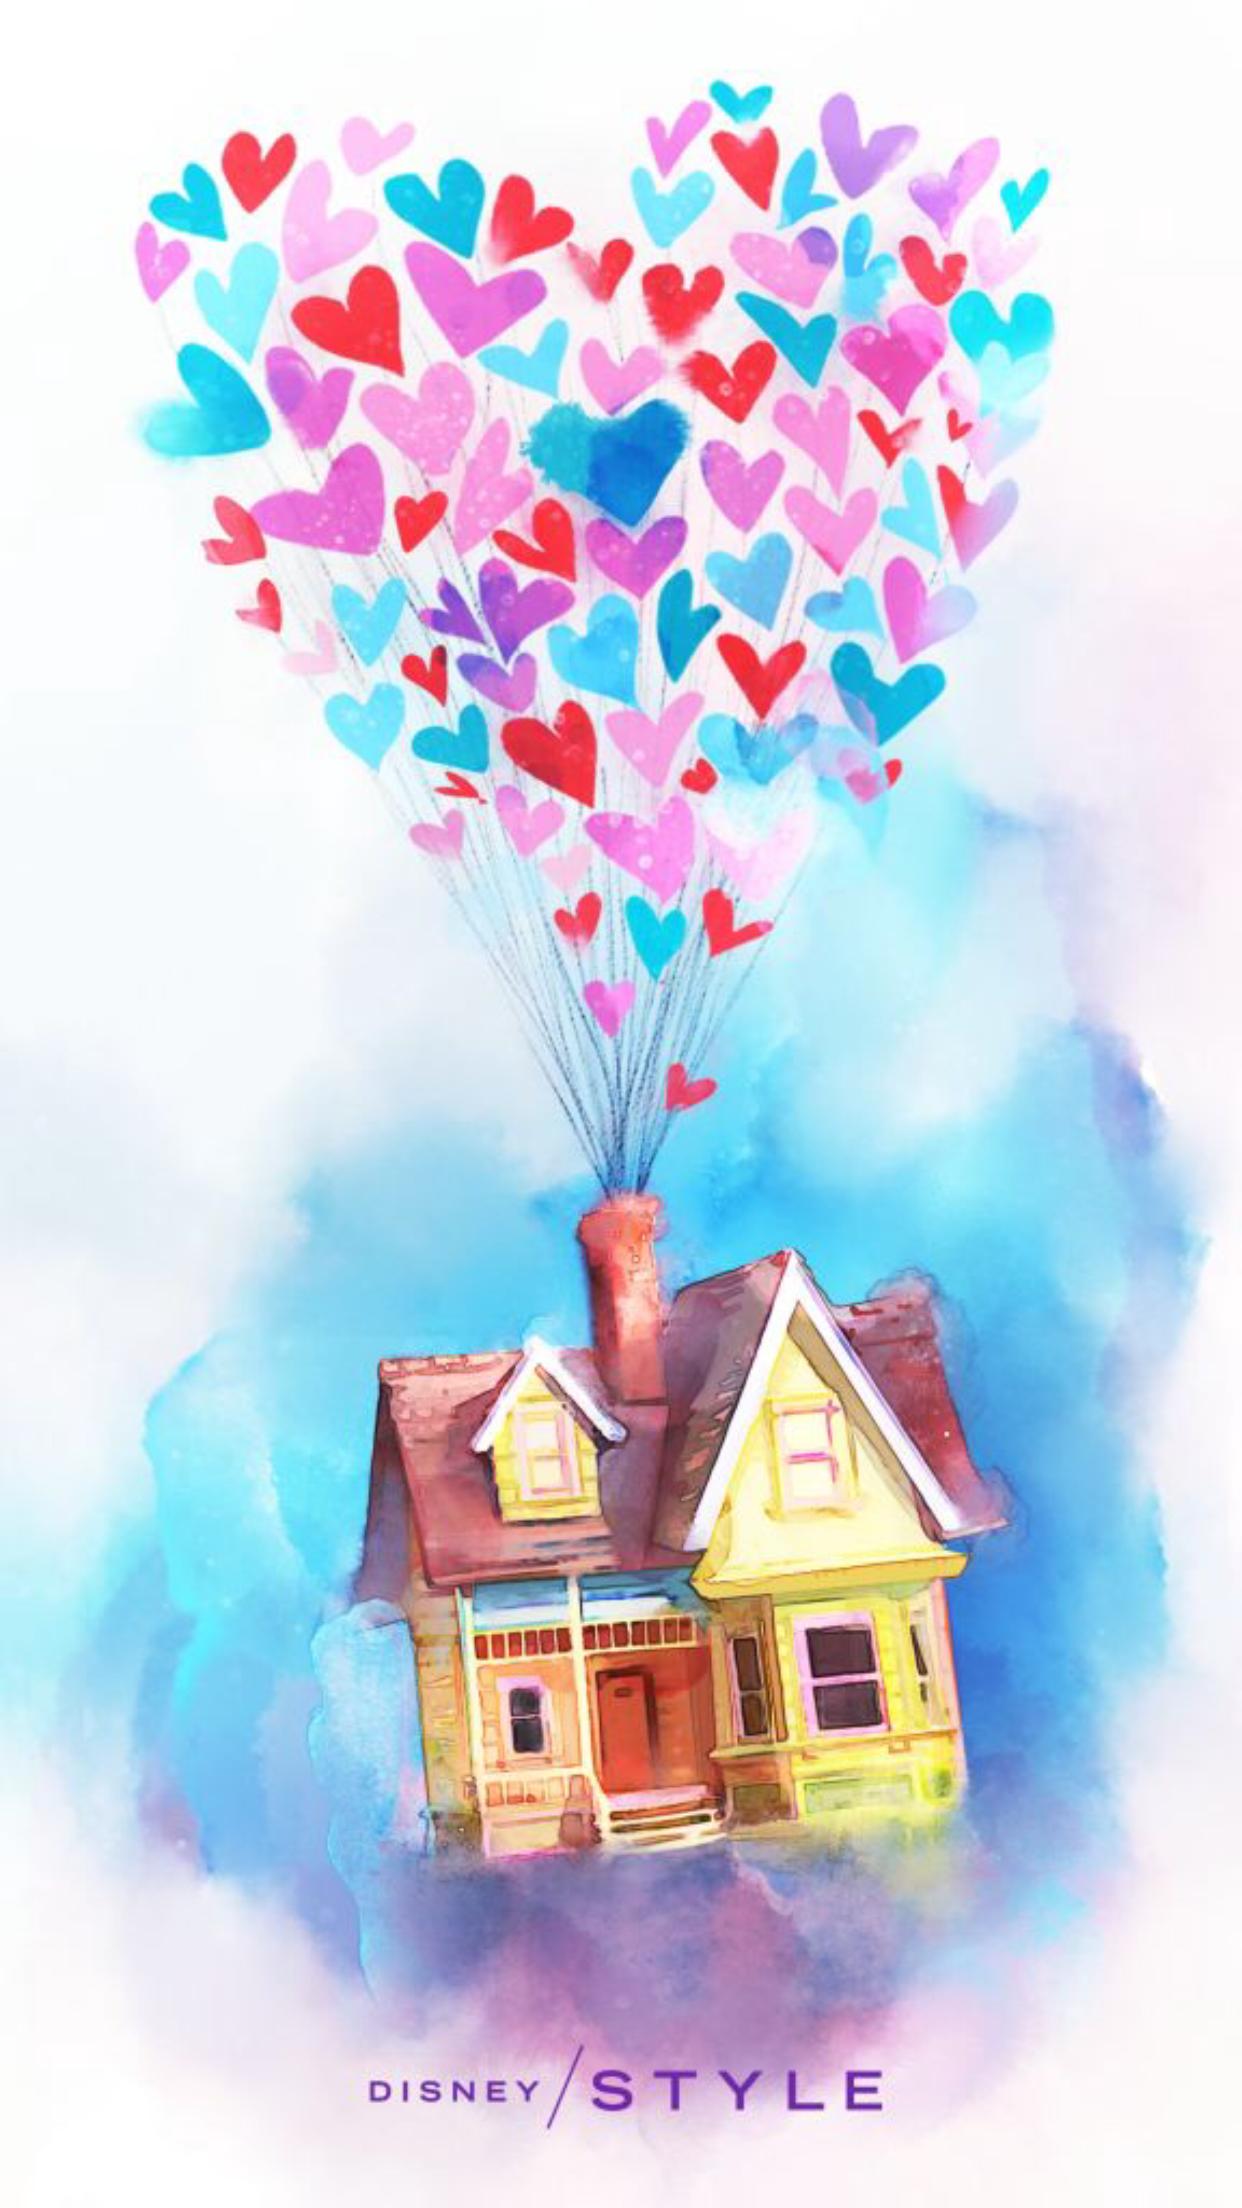 Pin By Stephanie Vander Vorst On Phone Disney Wallpaper Disney Valentines Cute Disney Wallpaper